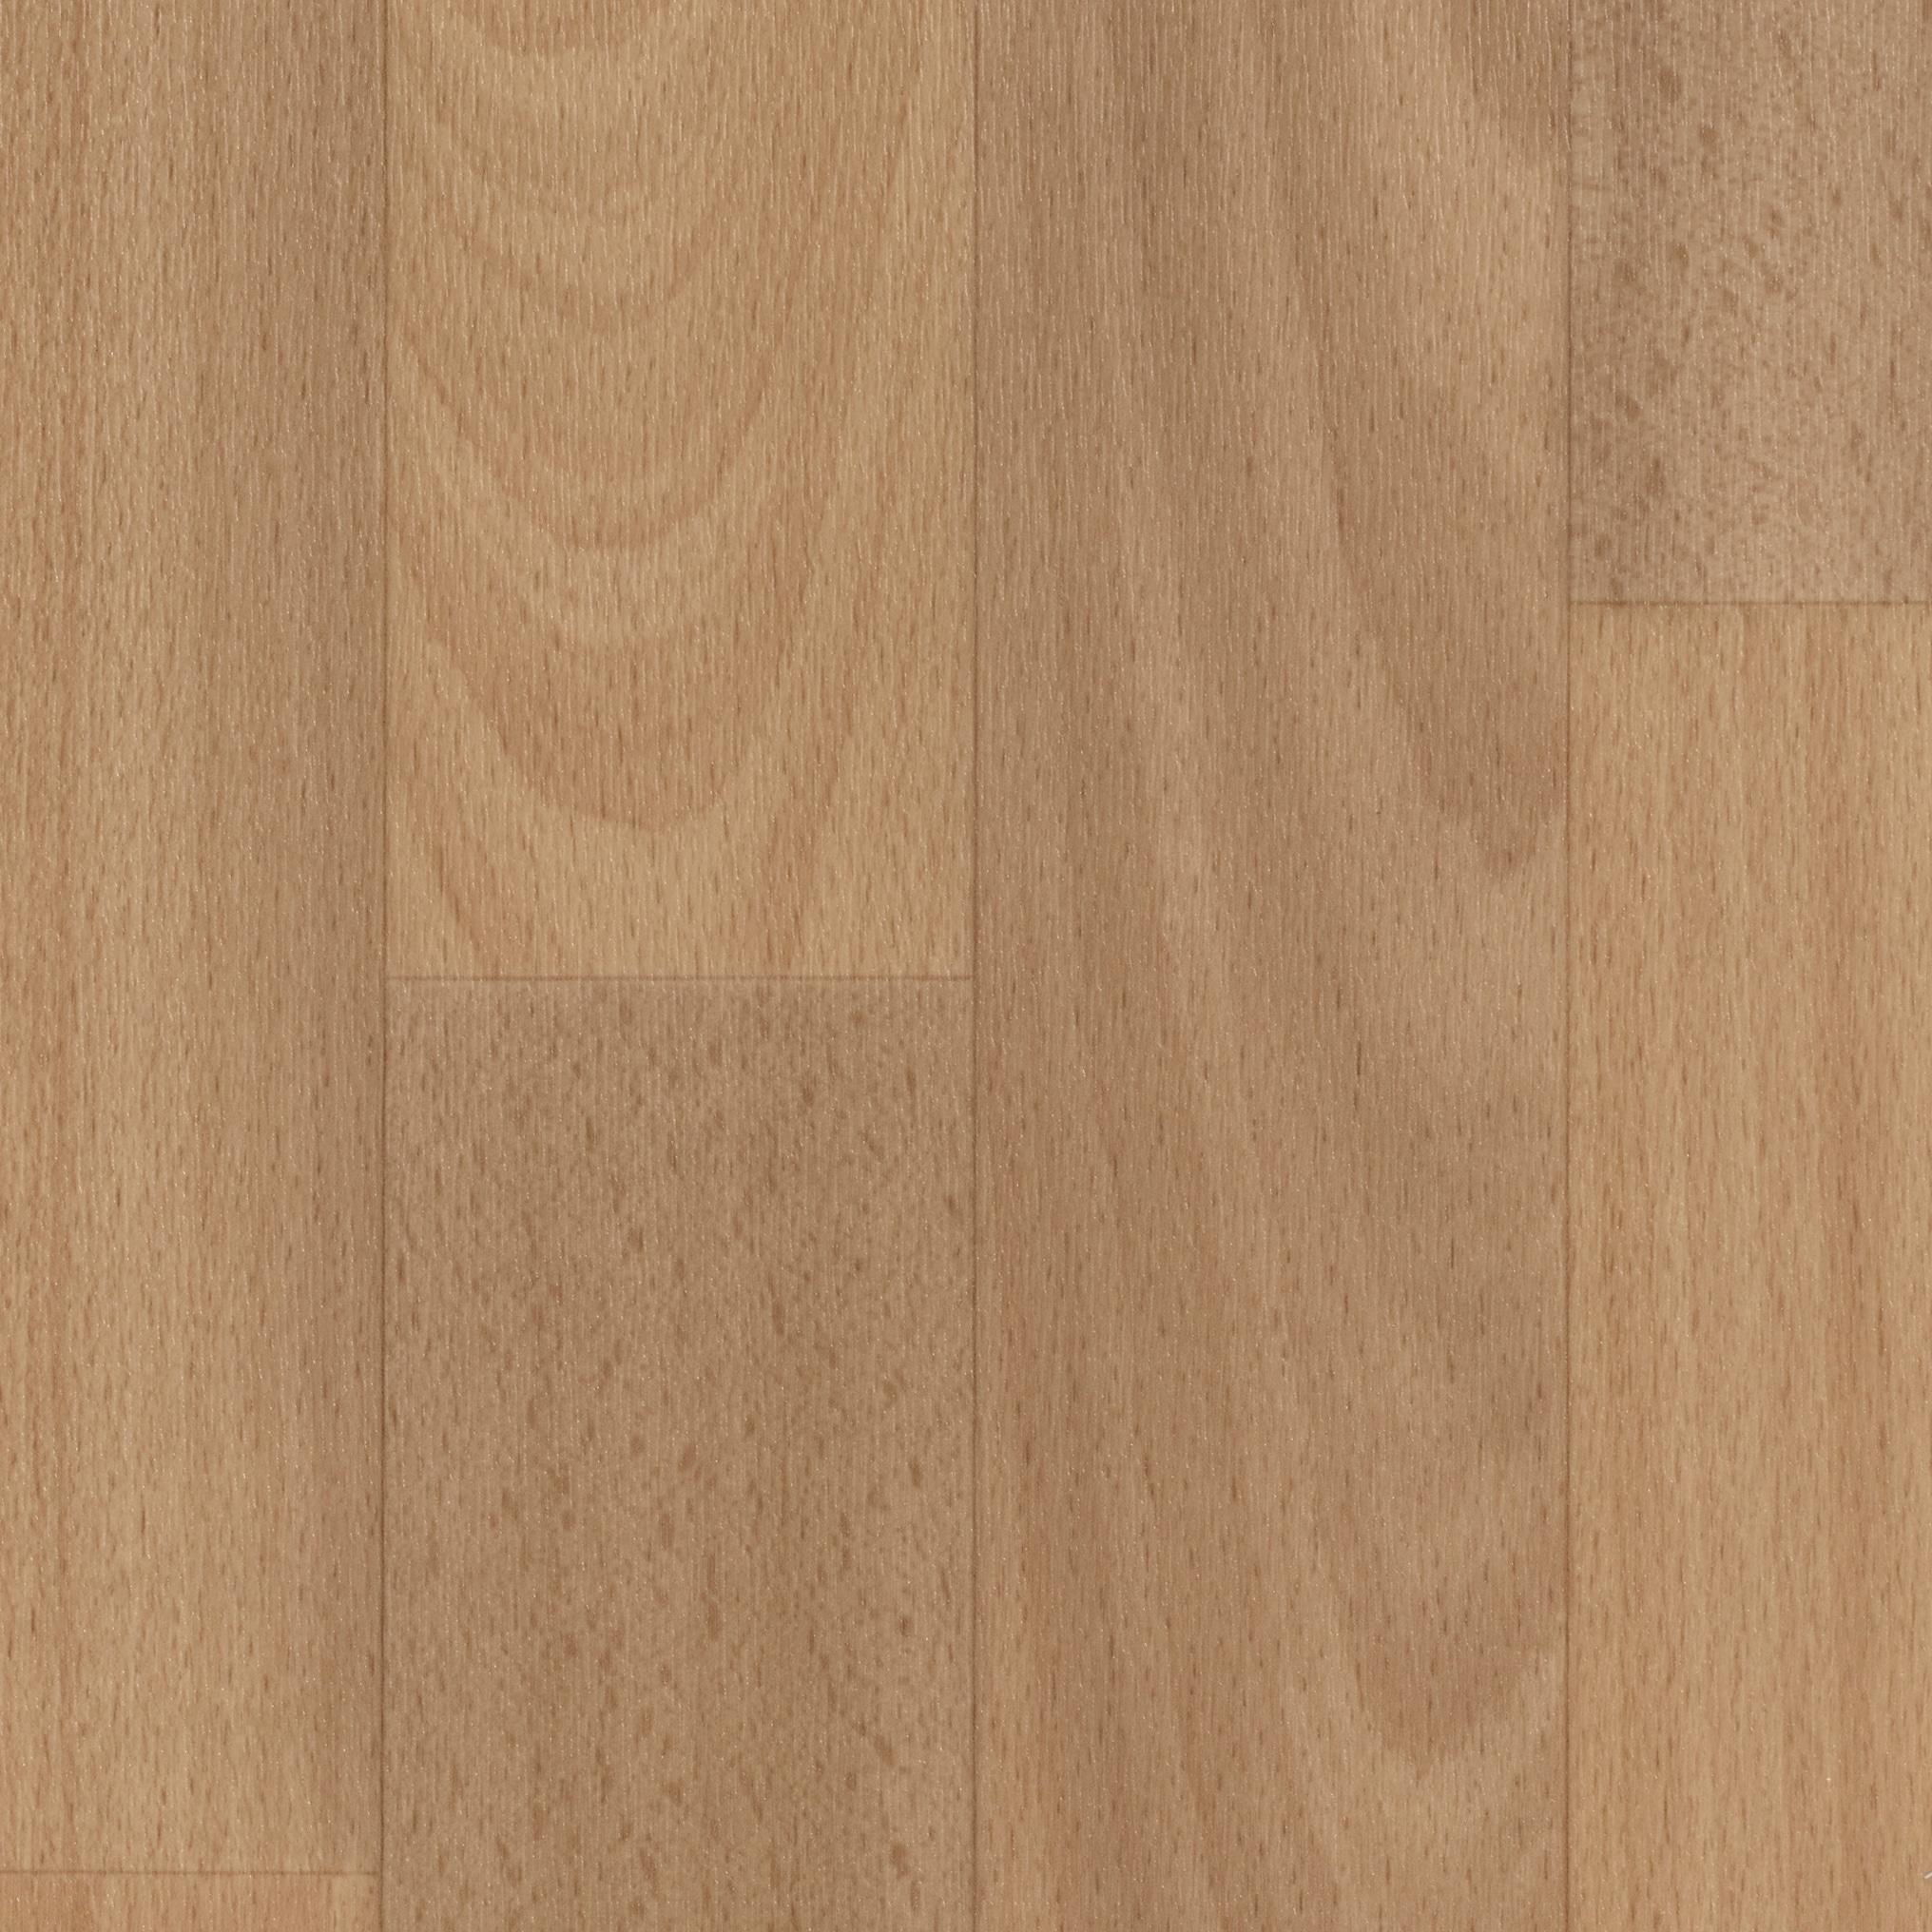 Bodenmeister Vinylboden PVC Bodenbelag Schiffsboden braun Bodenbeläge Bauen Renovieren